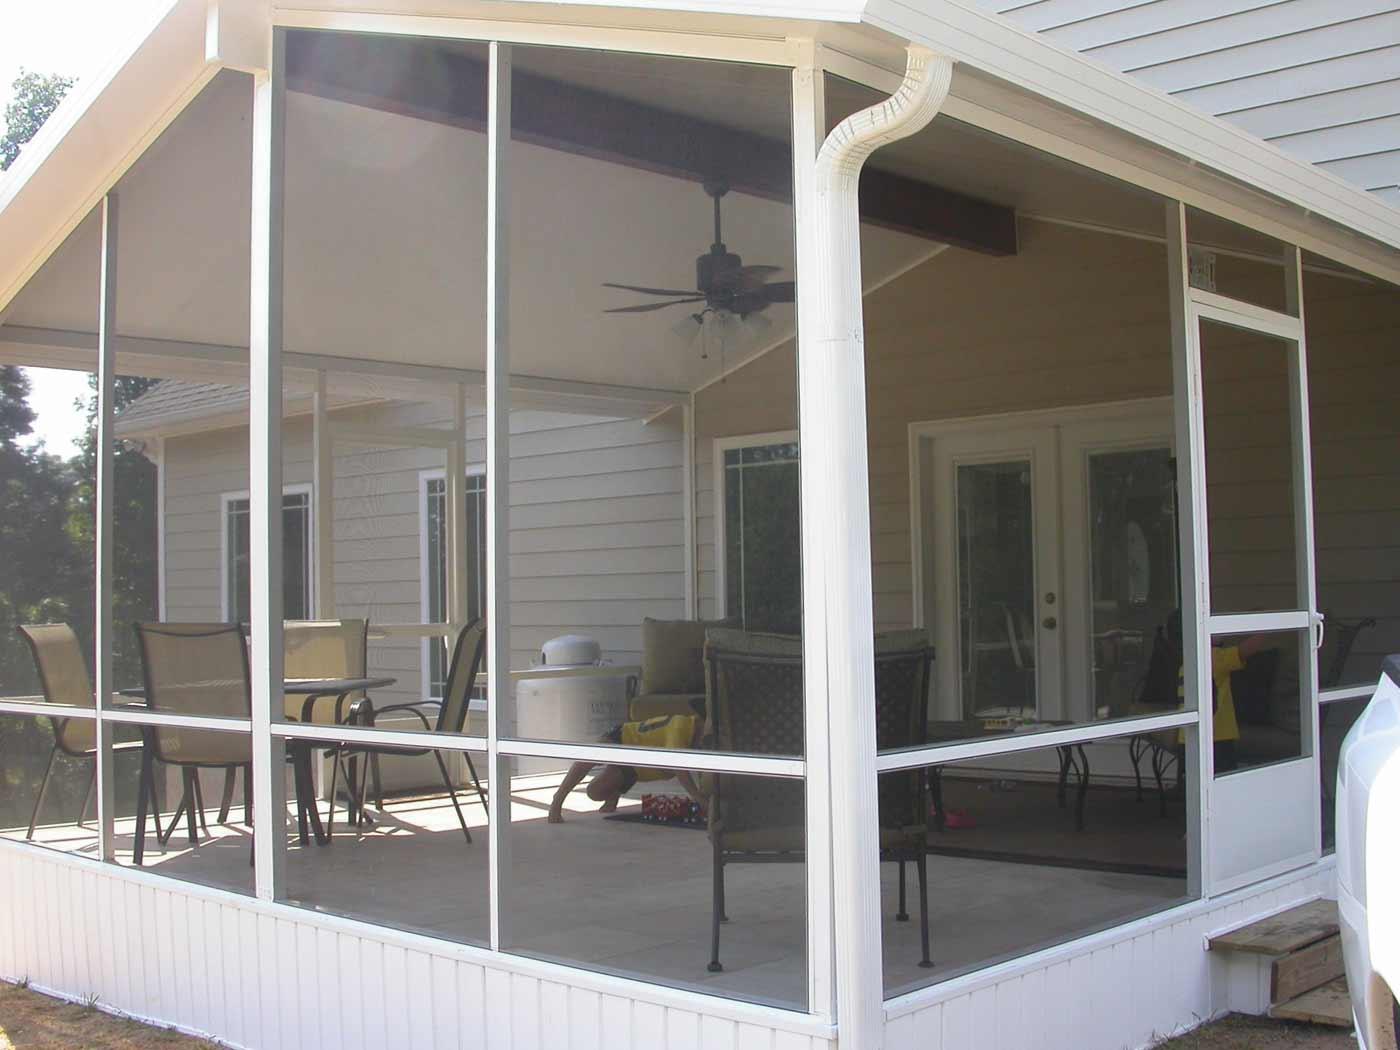 Metal frame awning windows for living room